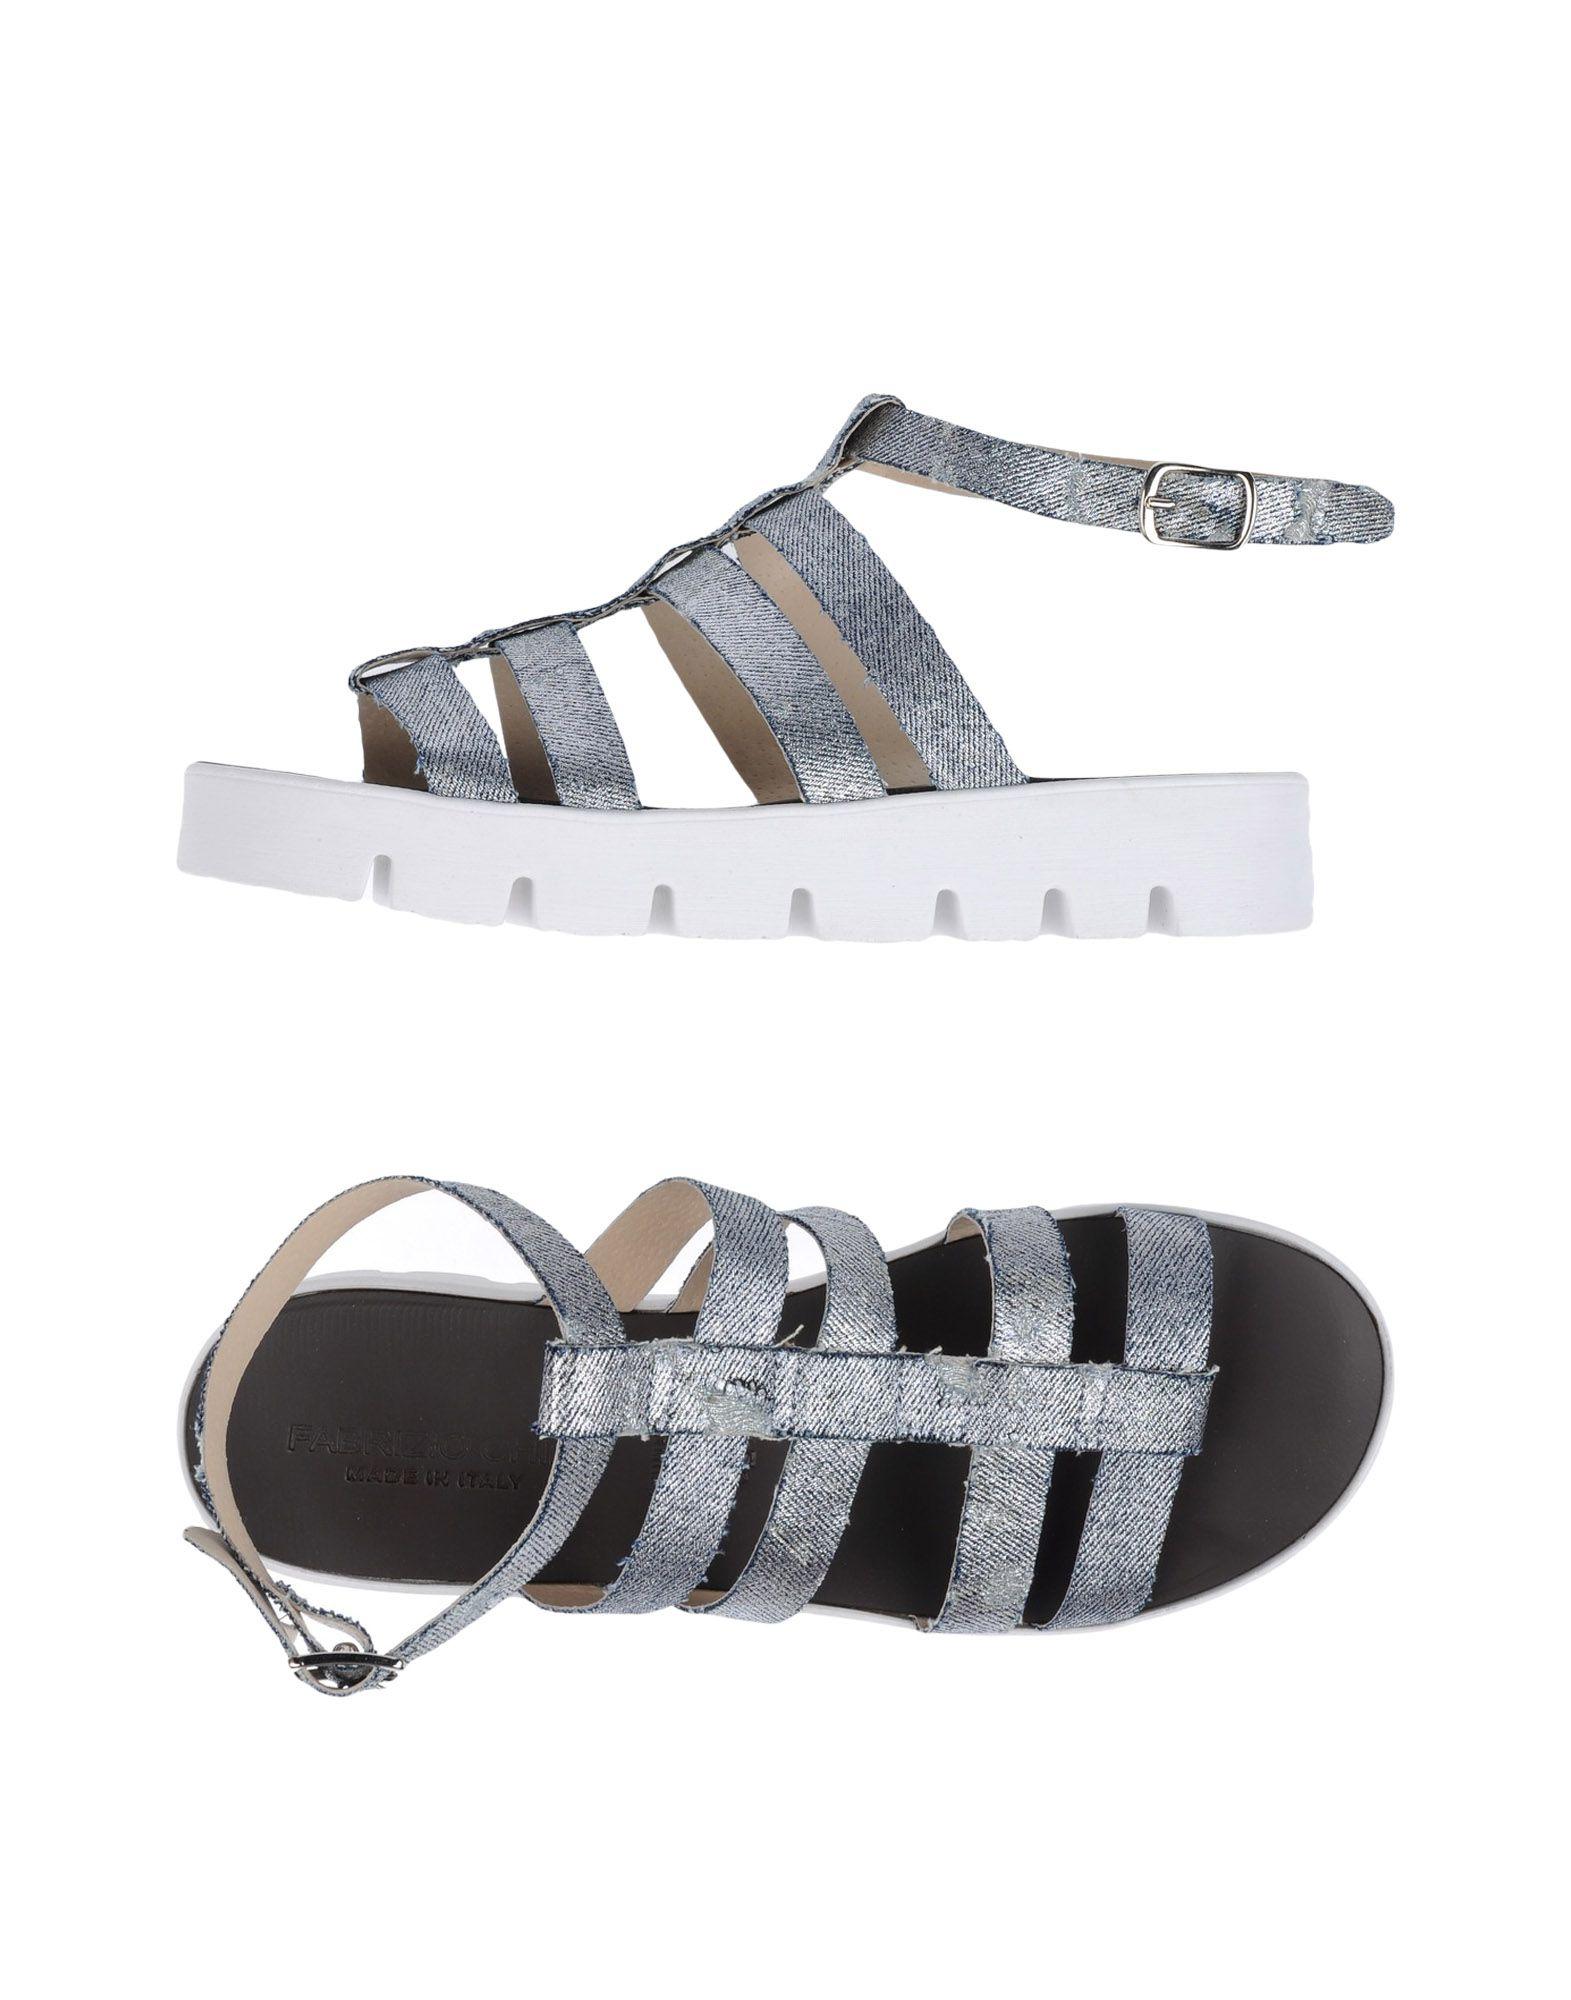 Fabrizio Chini Sandalen Damen  11238166GR Gute Qualität beliebte Schuhe